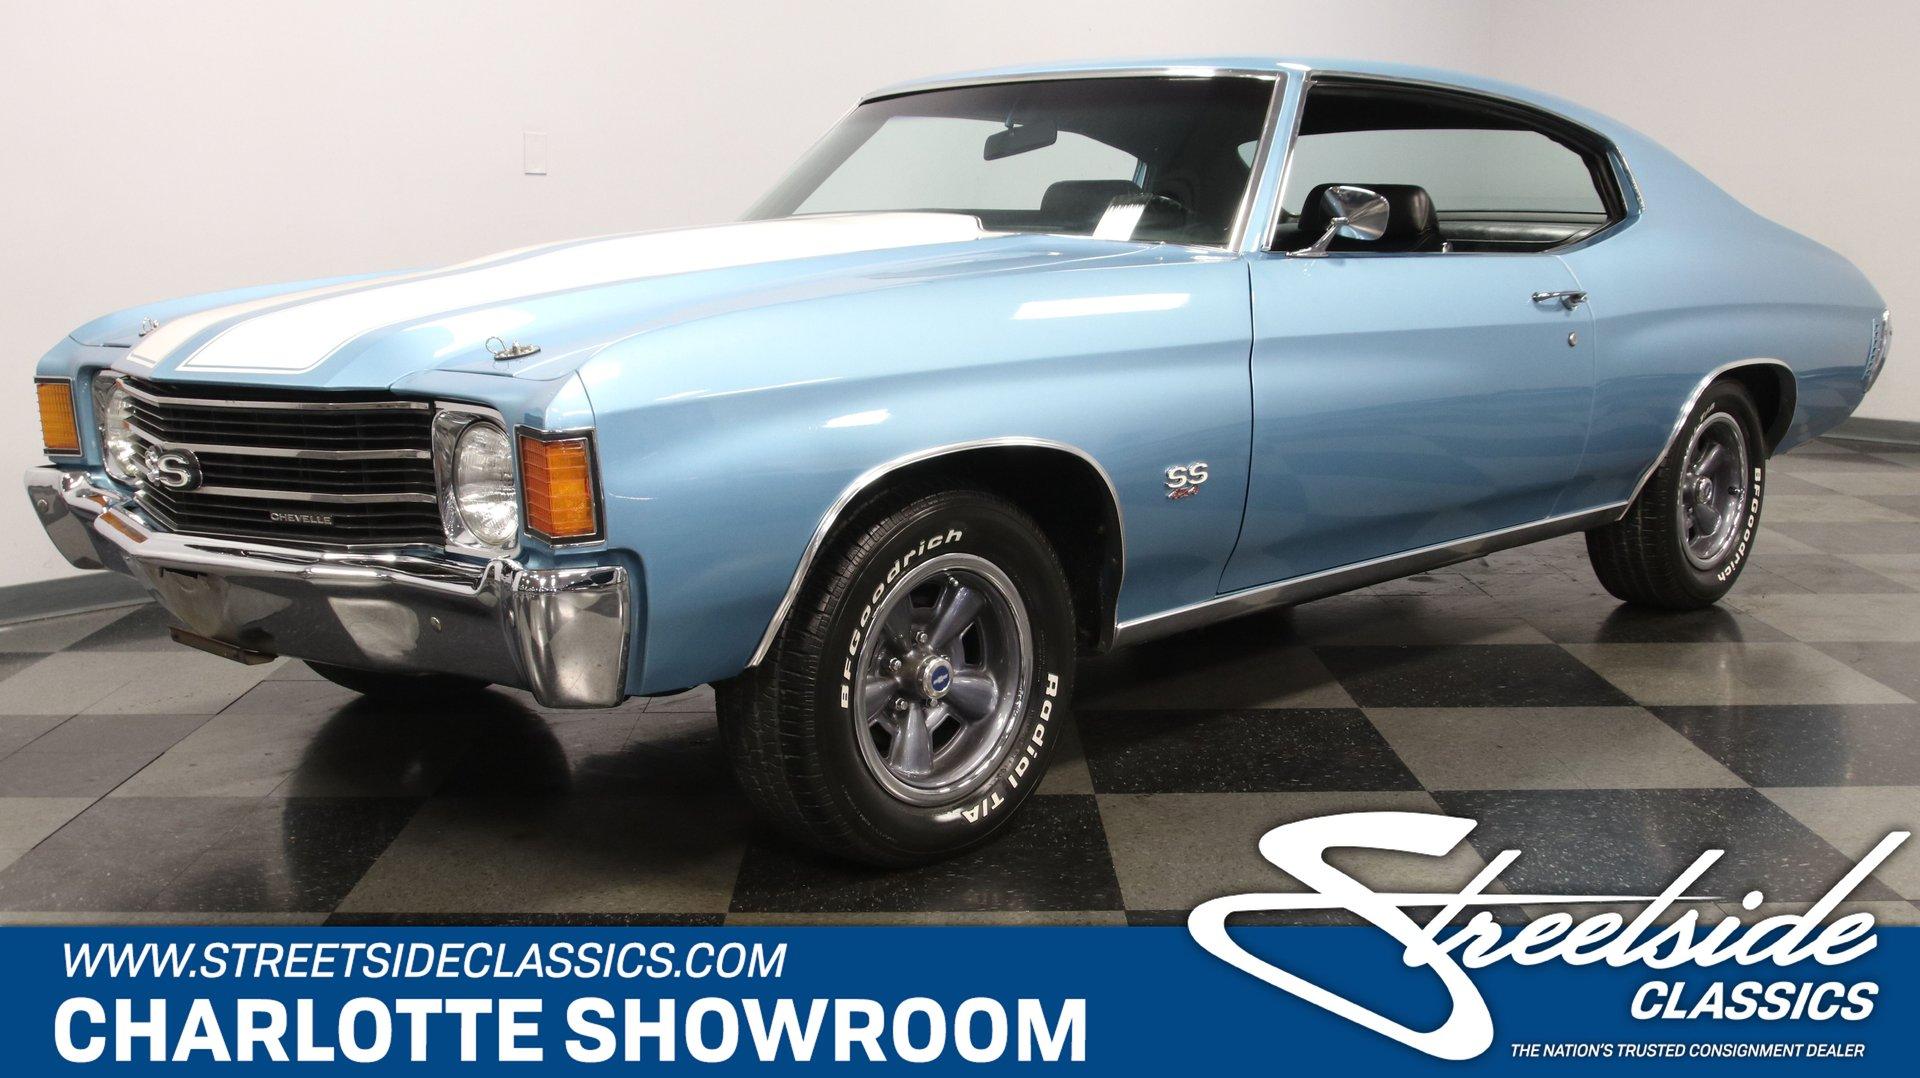 1972 chevrolet chevelle ss 454 tribute